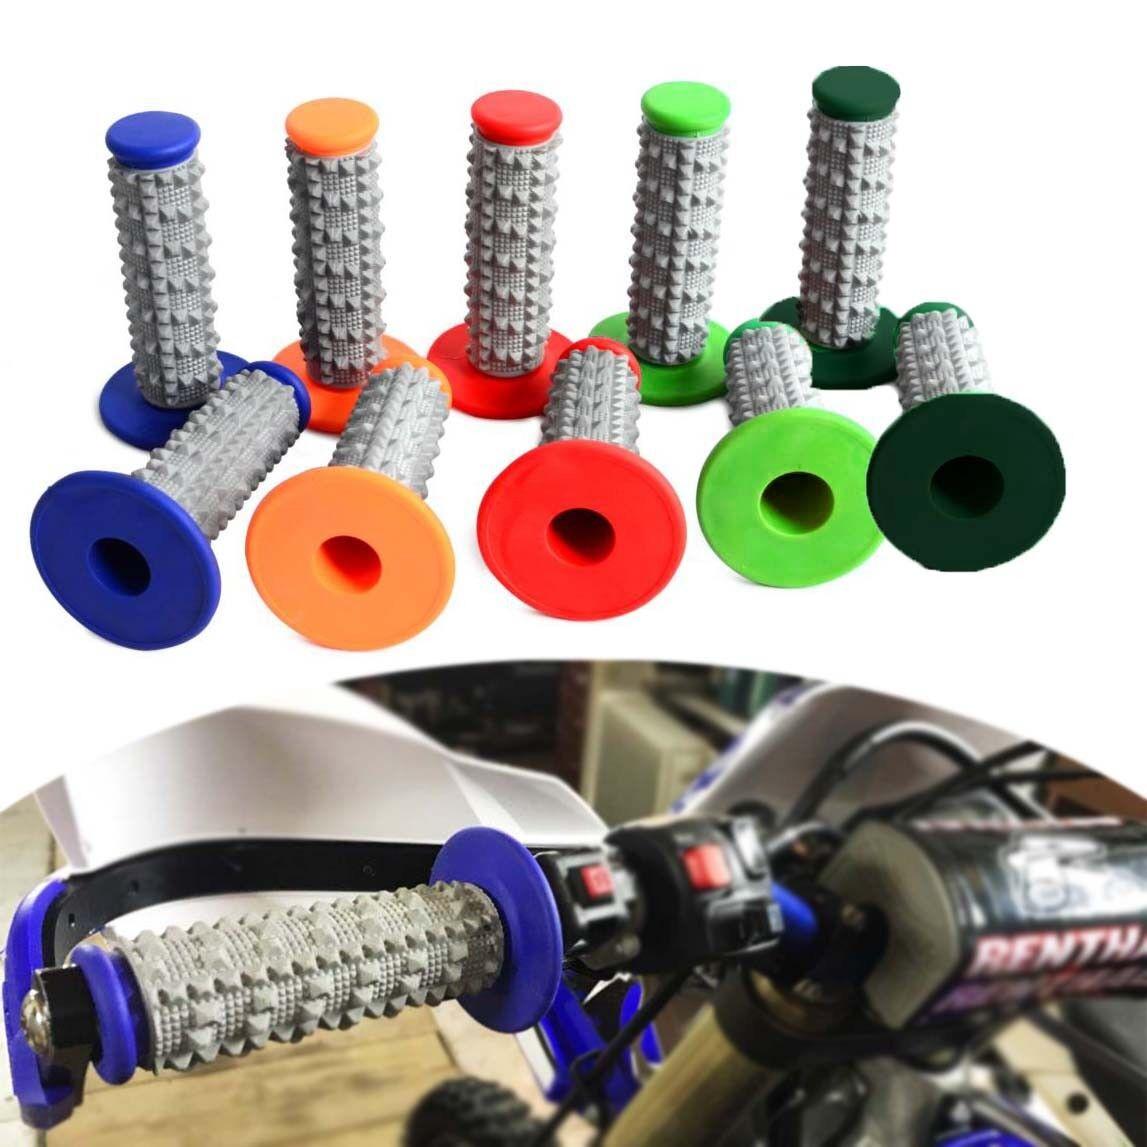 22mm Soft Rubber Handlebar Green Grips For Chinese Pit MX Dirt Bikes motorcross